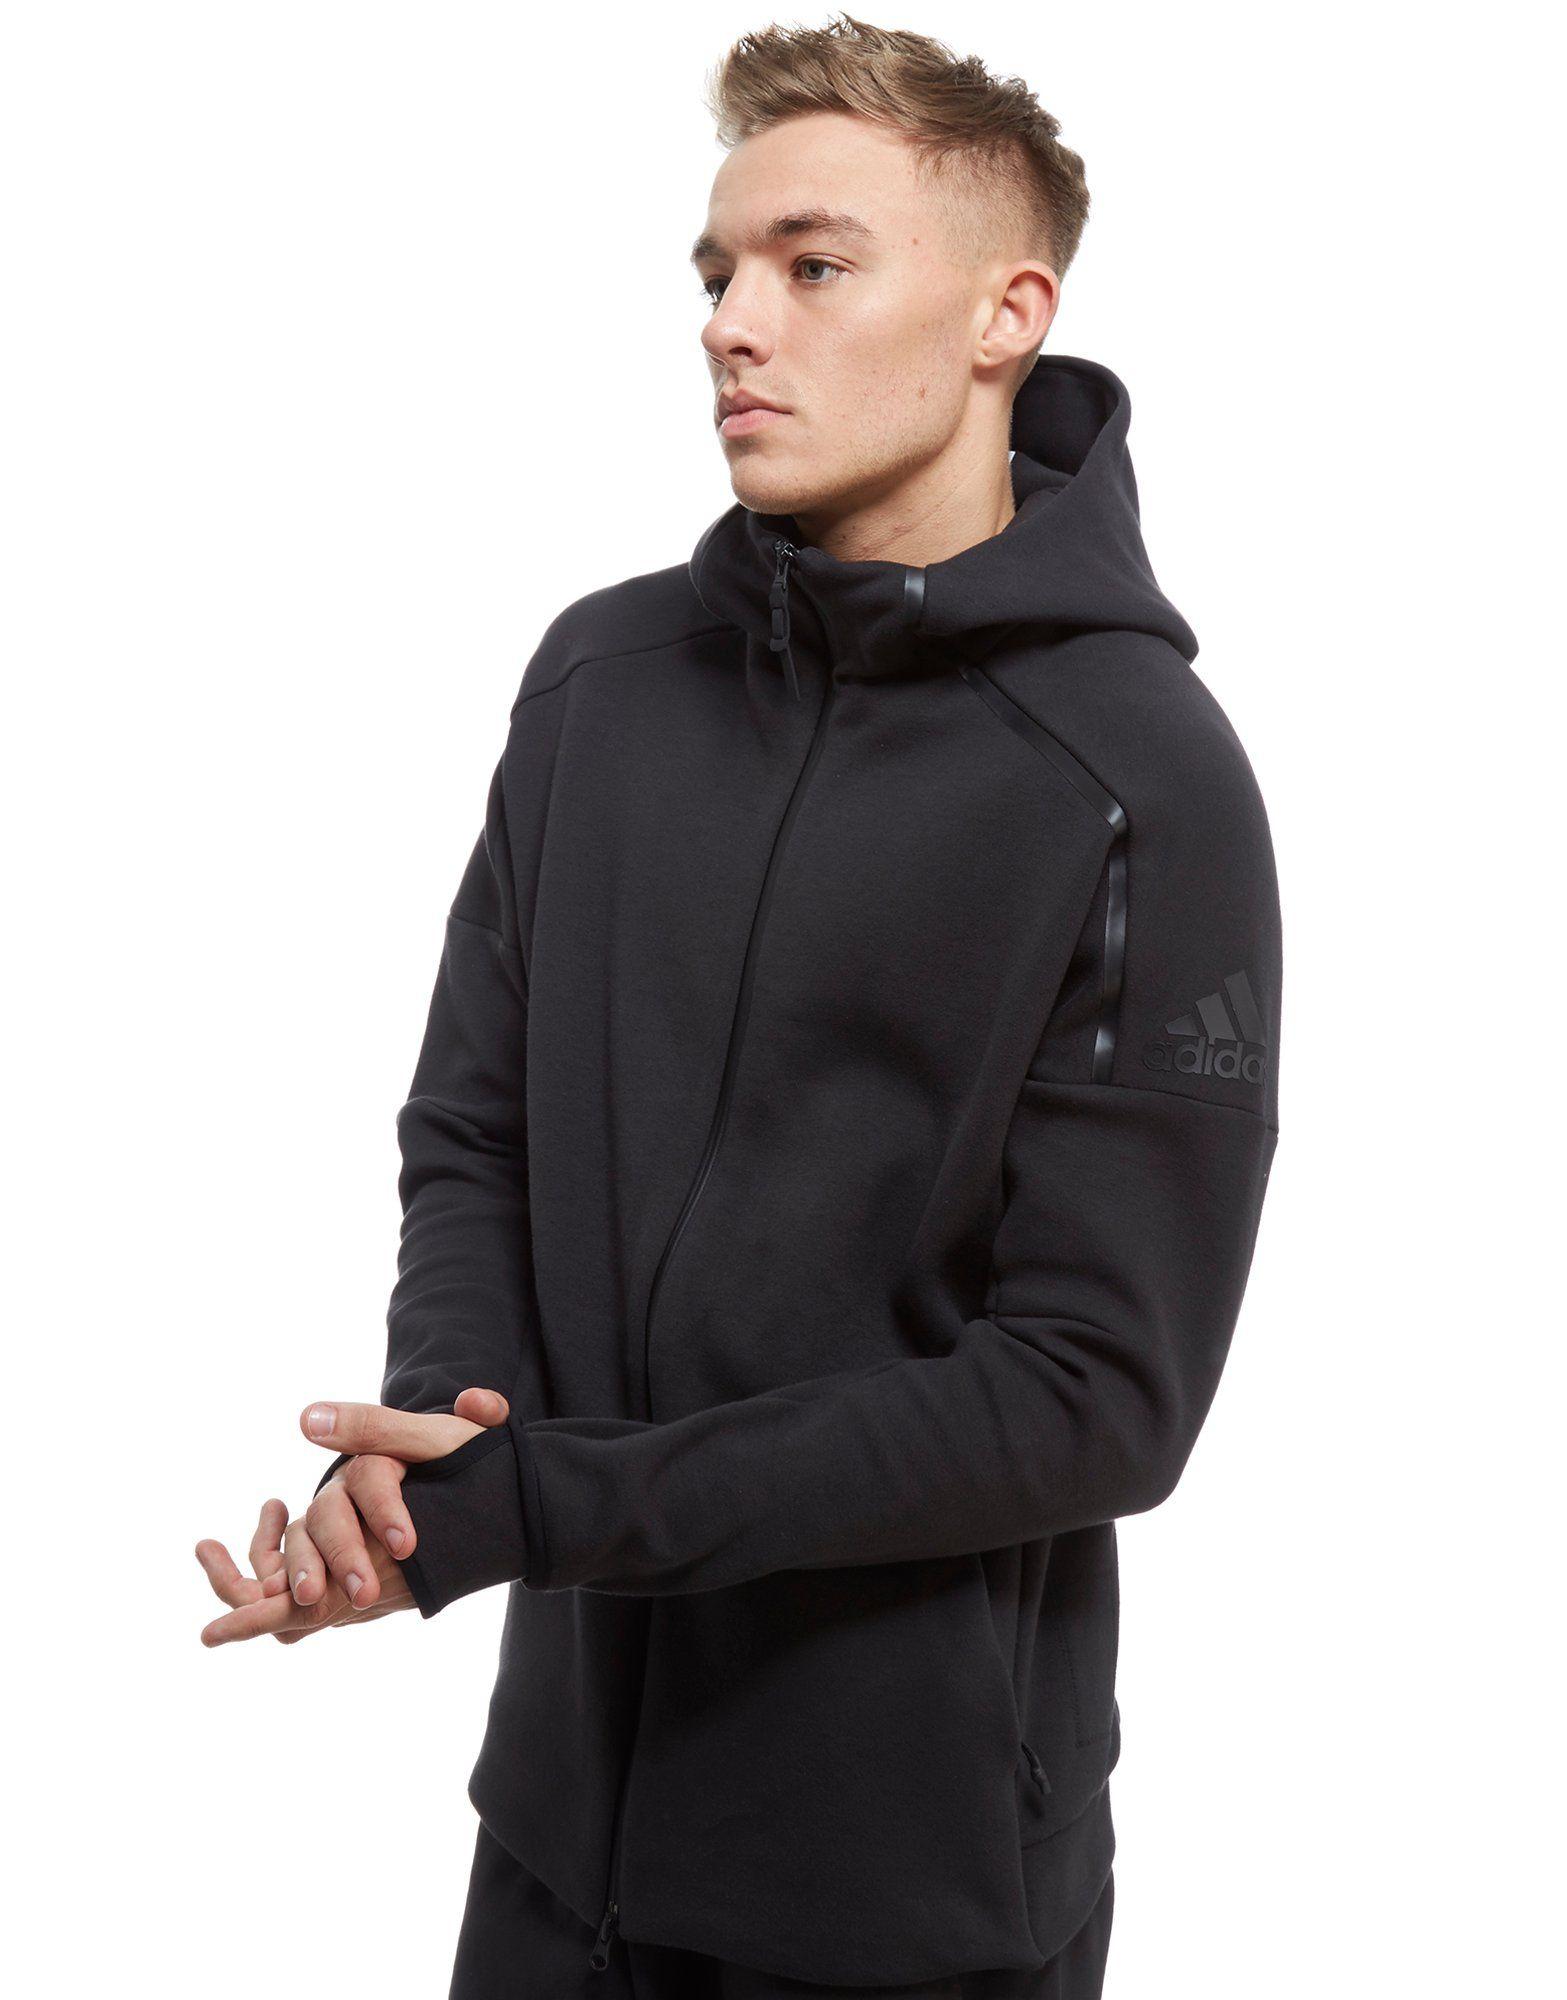 adidas zne hoodie 2 0 jd sports. Black Bedroom Furniture Sets. Home Design Ideas